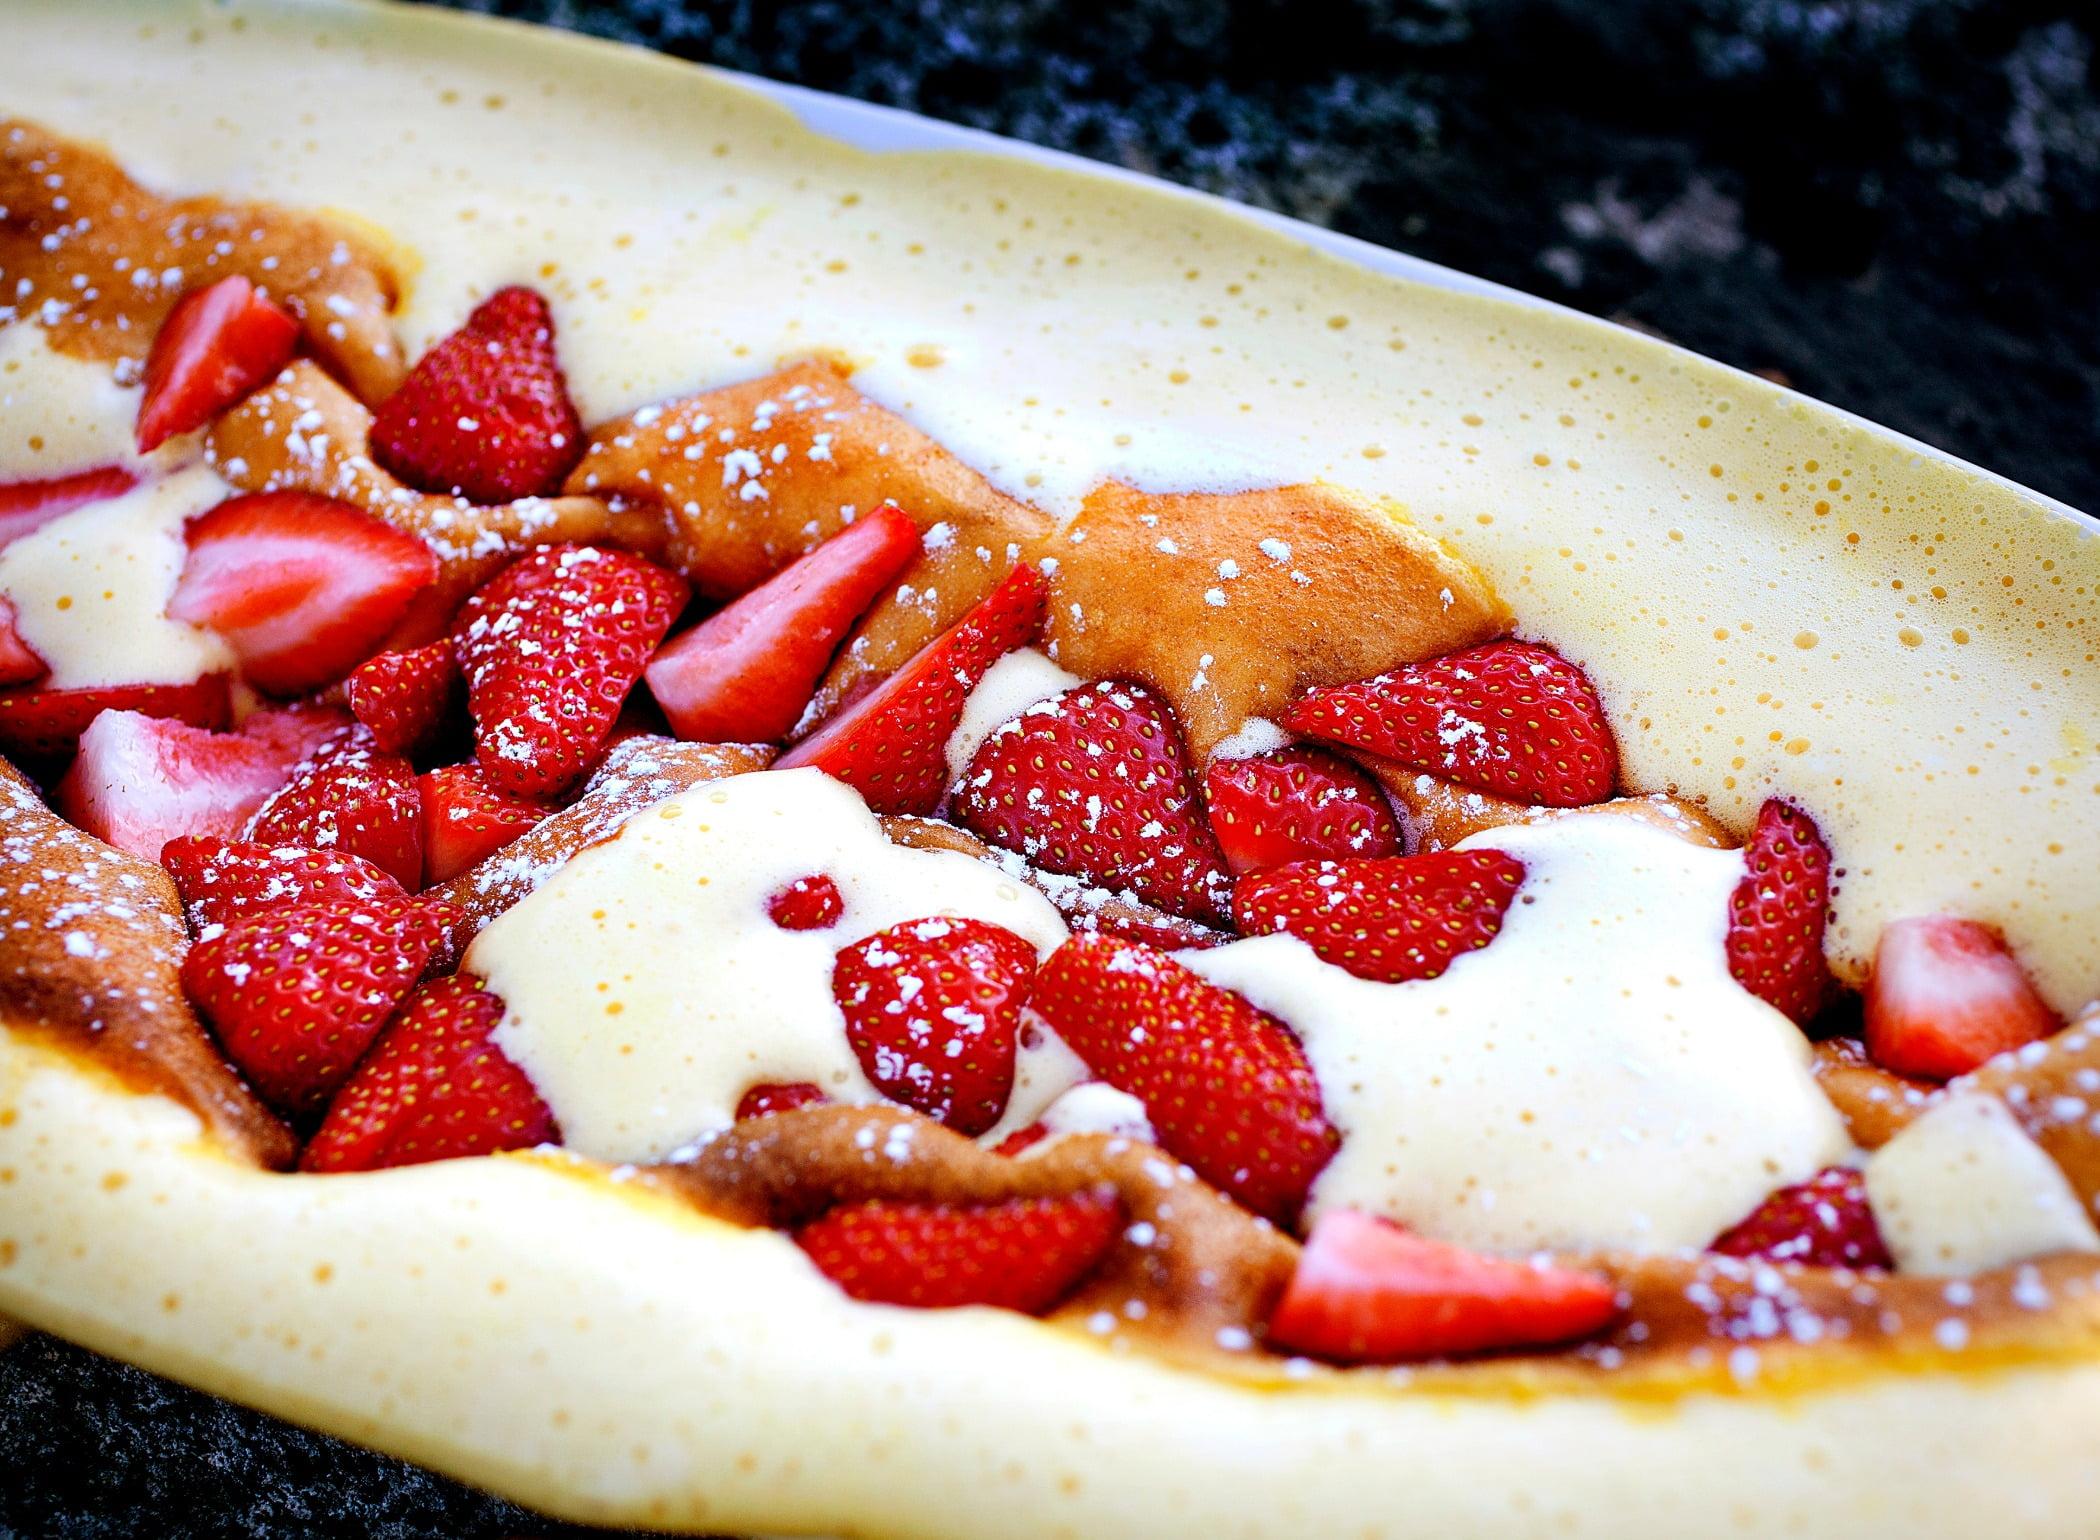 Baked goods, Natural foods, Food, Fruit, Strawberry, Ingredient, Recipe, Cuisine, Strawberries, Cream